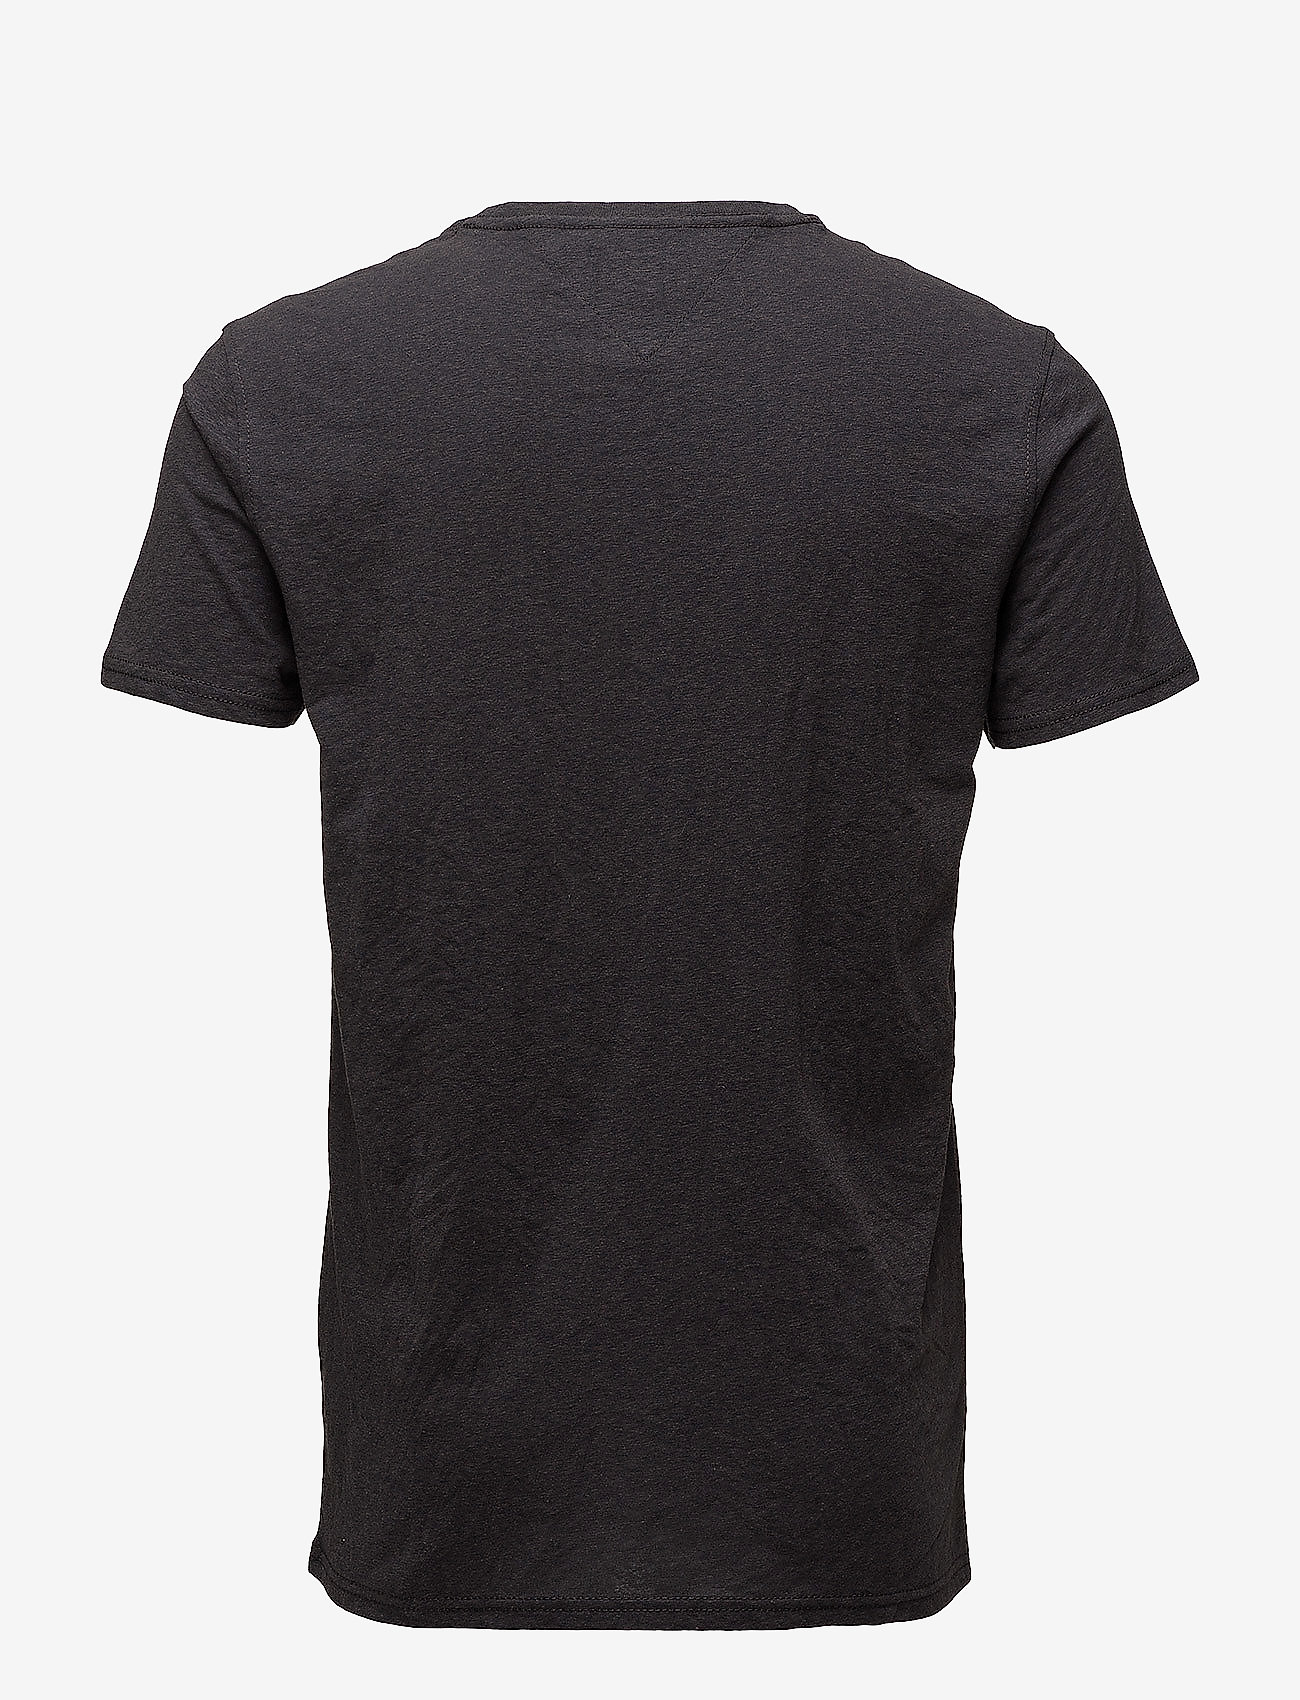 Tommy Jeans - TJM ORIGINAL TRIBLEND TEE - basic t-shirts - tommy black - 1